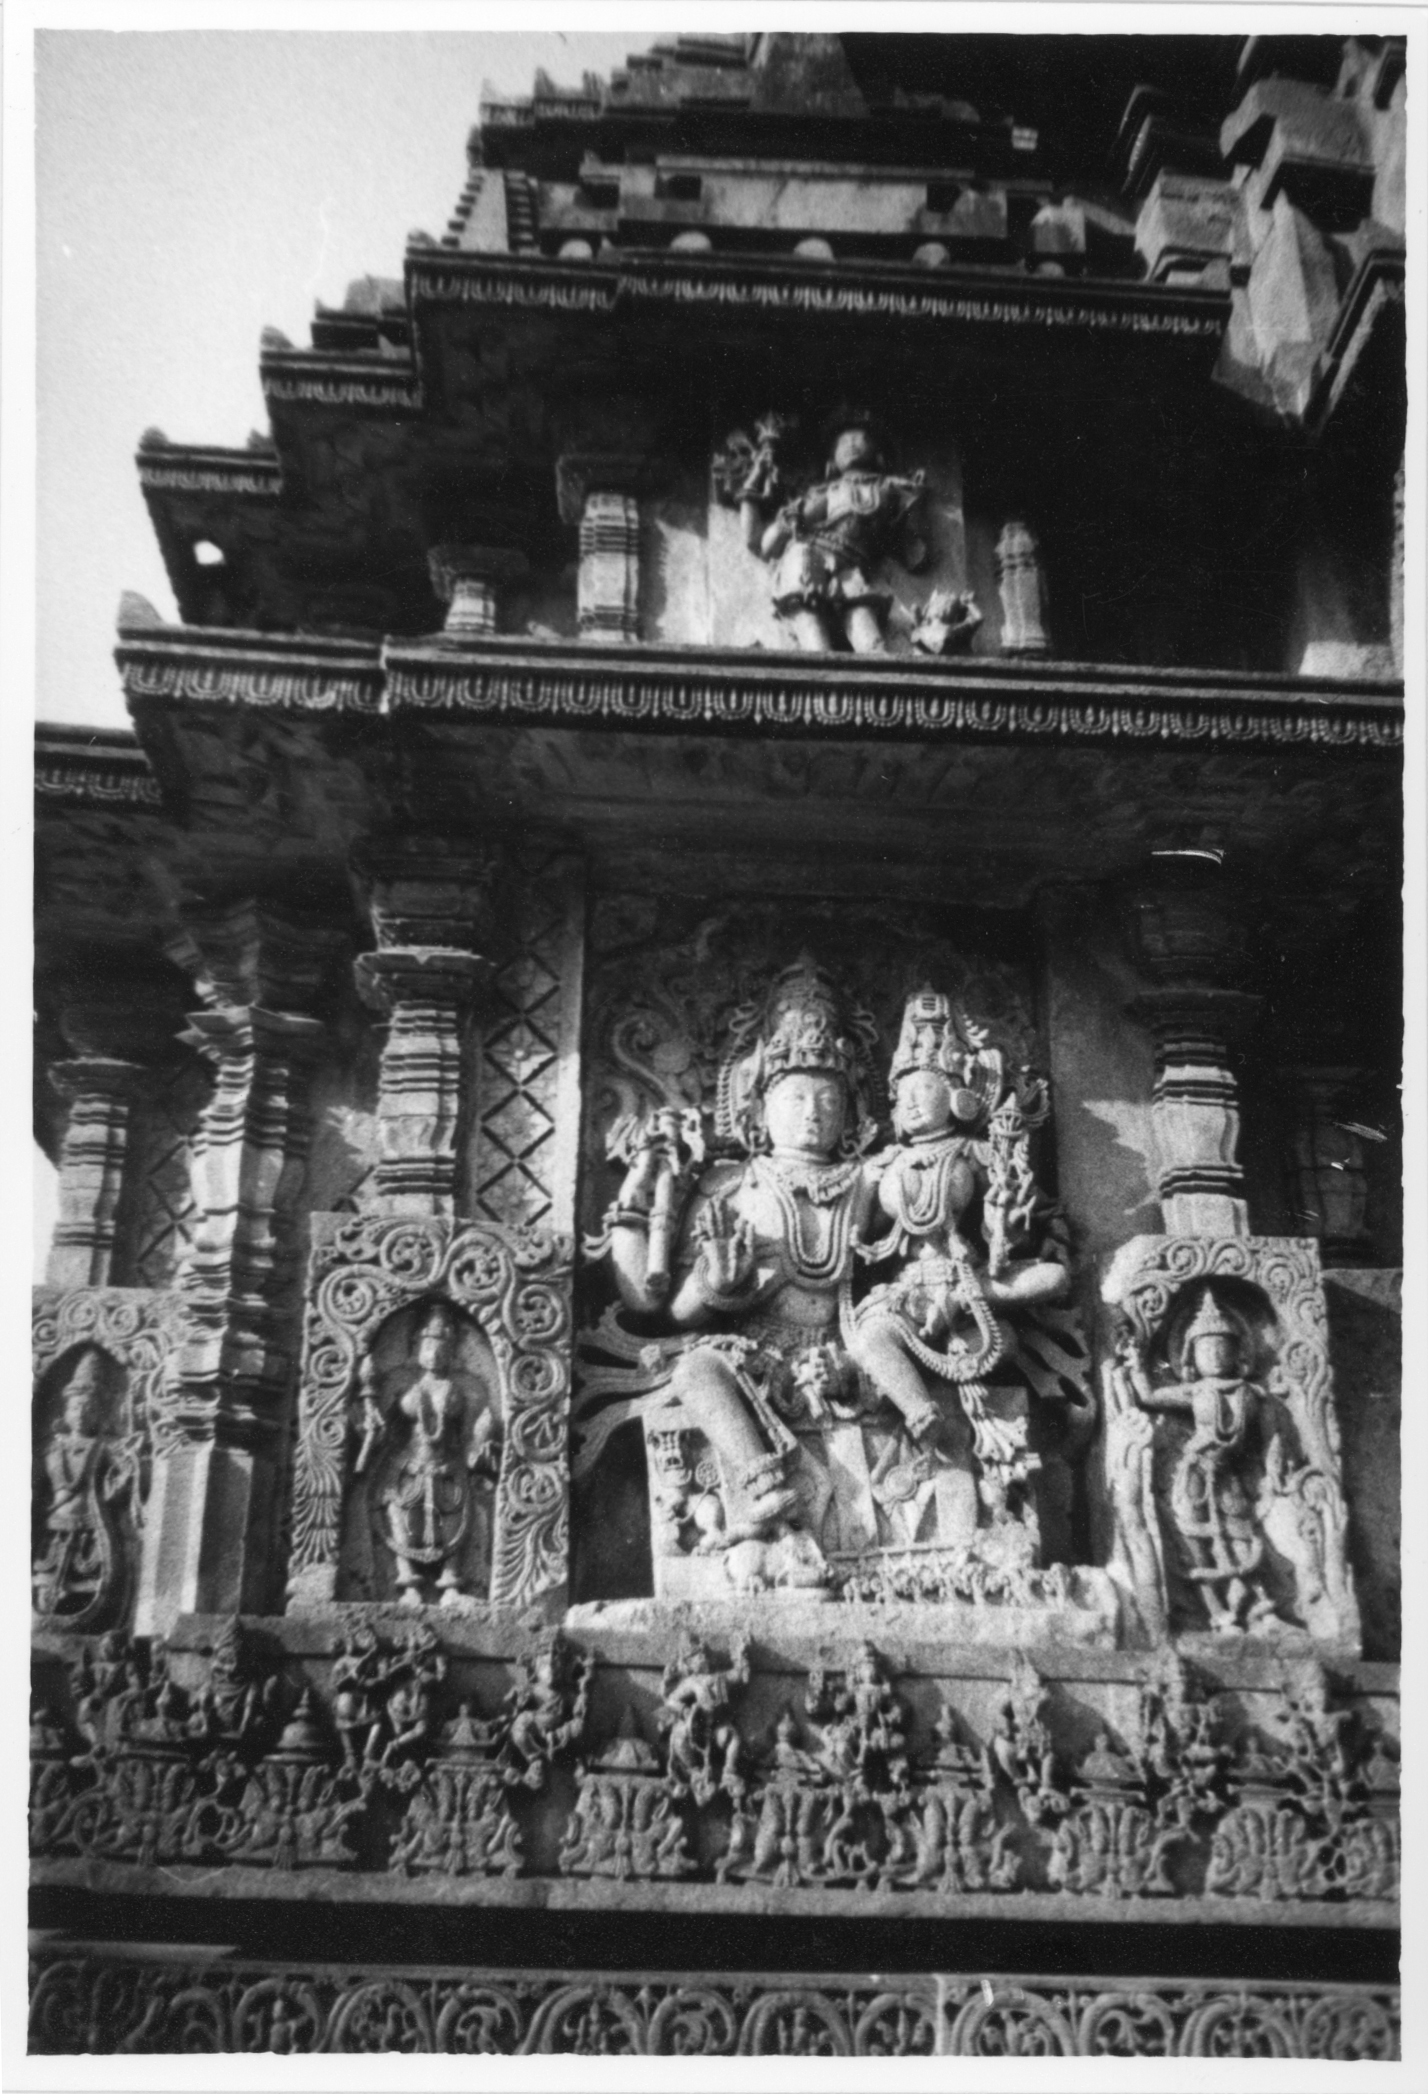 iuliana indian thai burmese hindu statues temple orient oriental